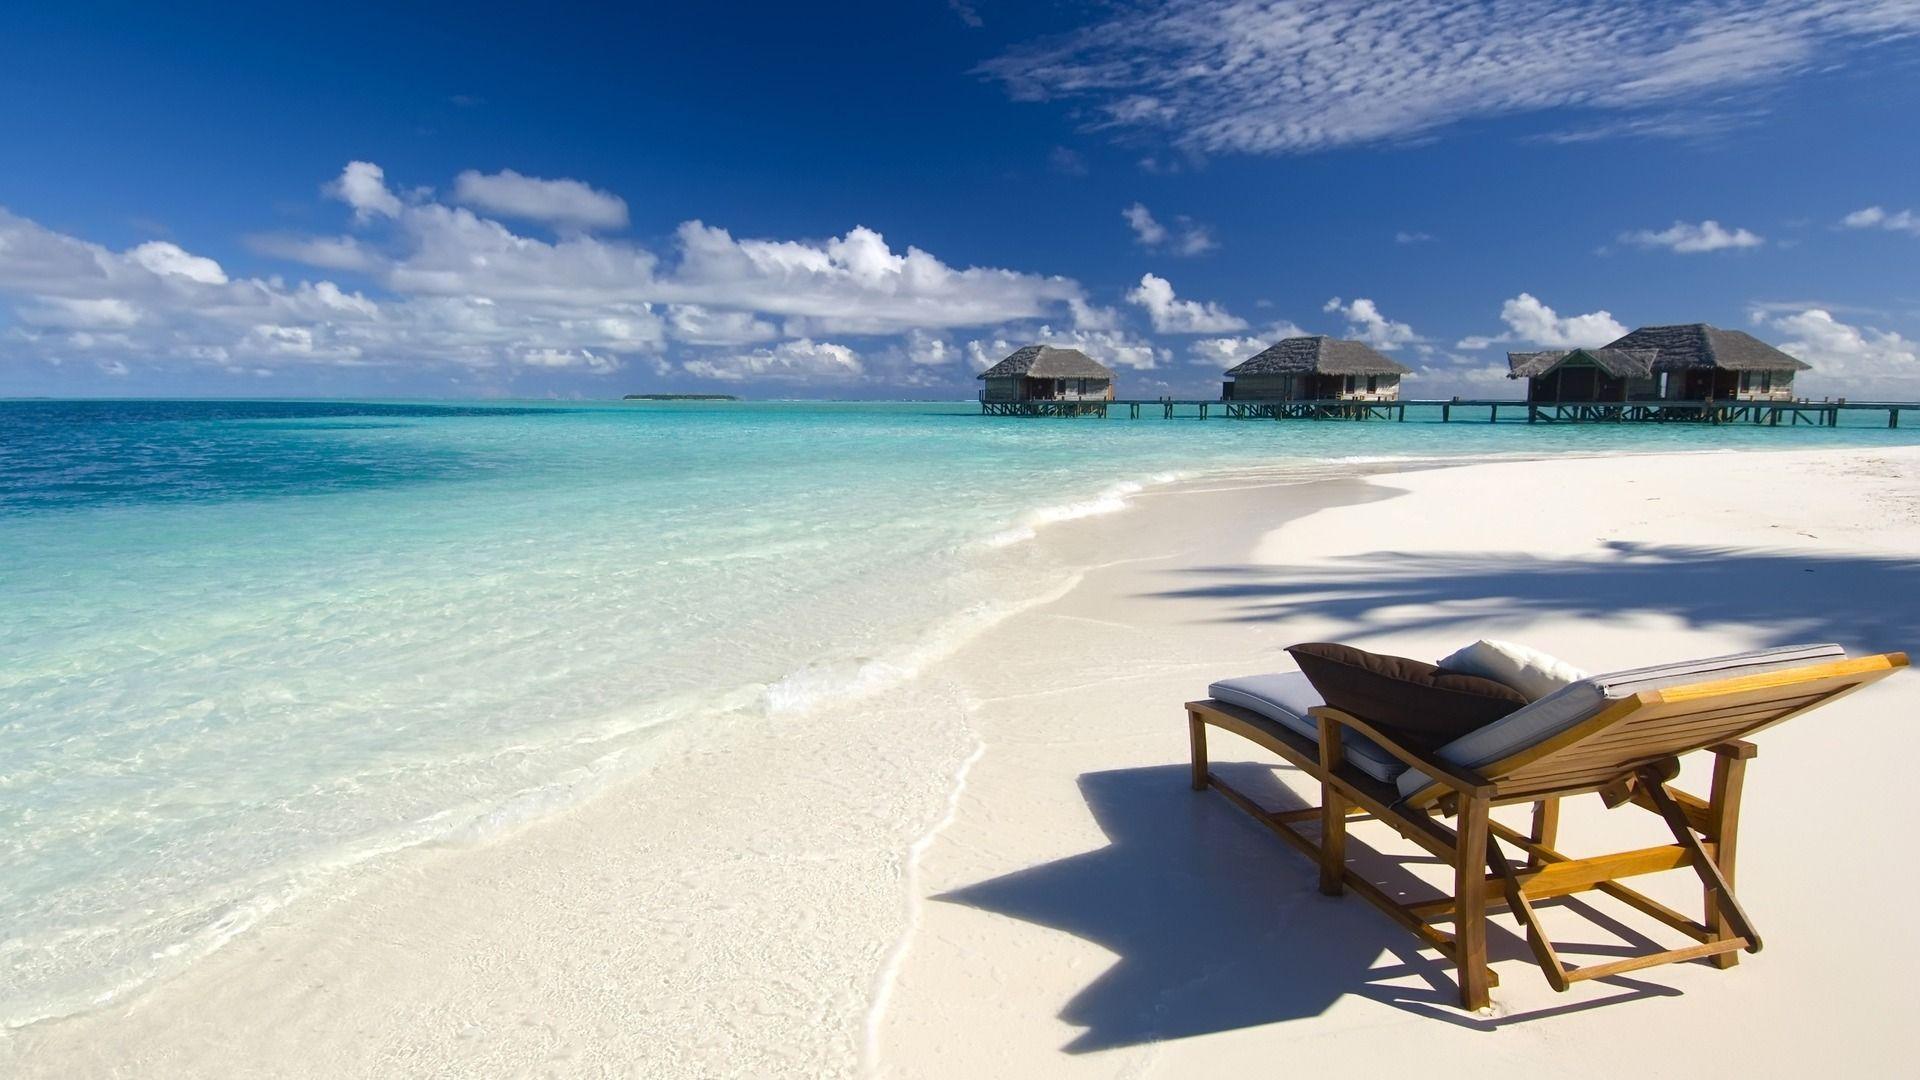 HD Beach Background